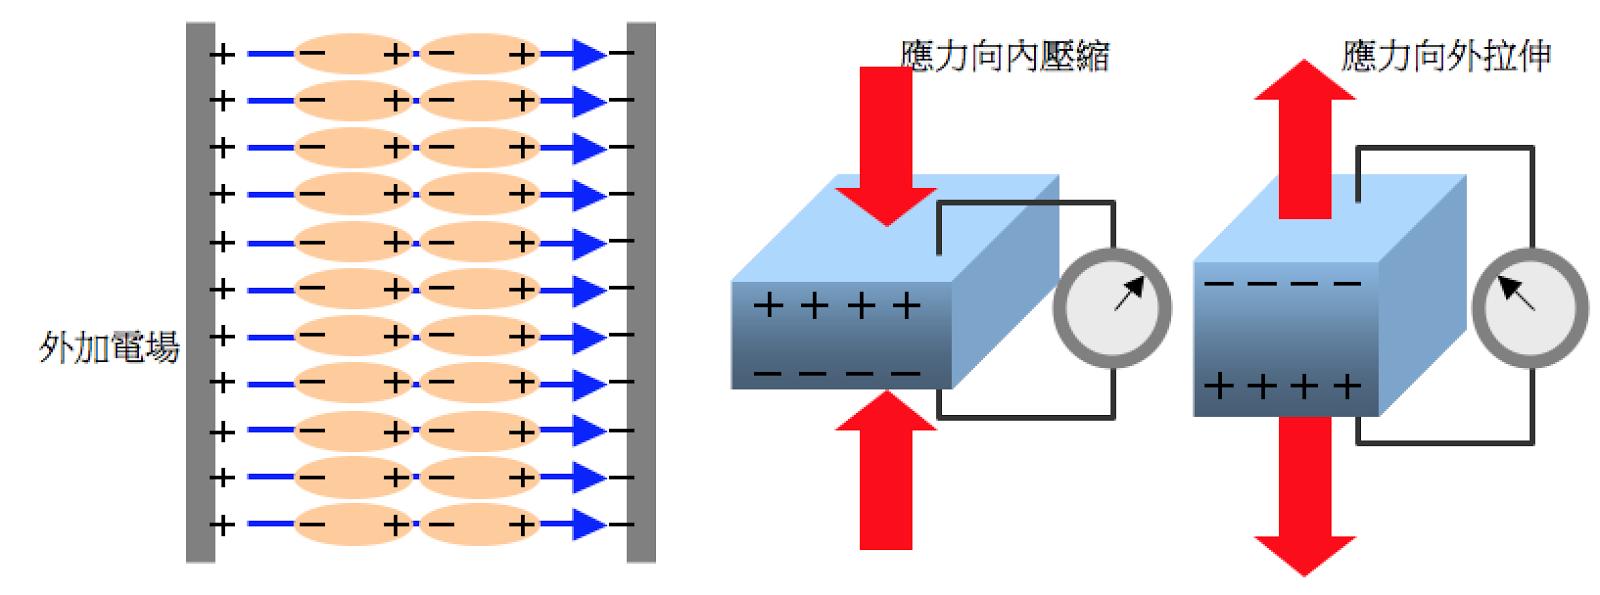 Fun Physics Studio 吳明德老師: 漫談壓電效應與超聲波